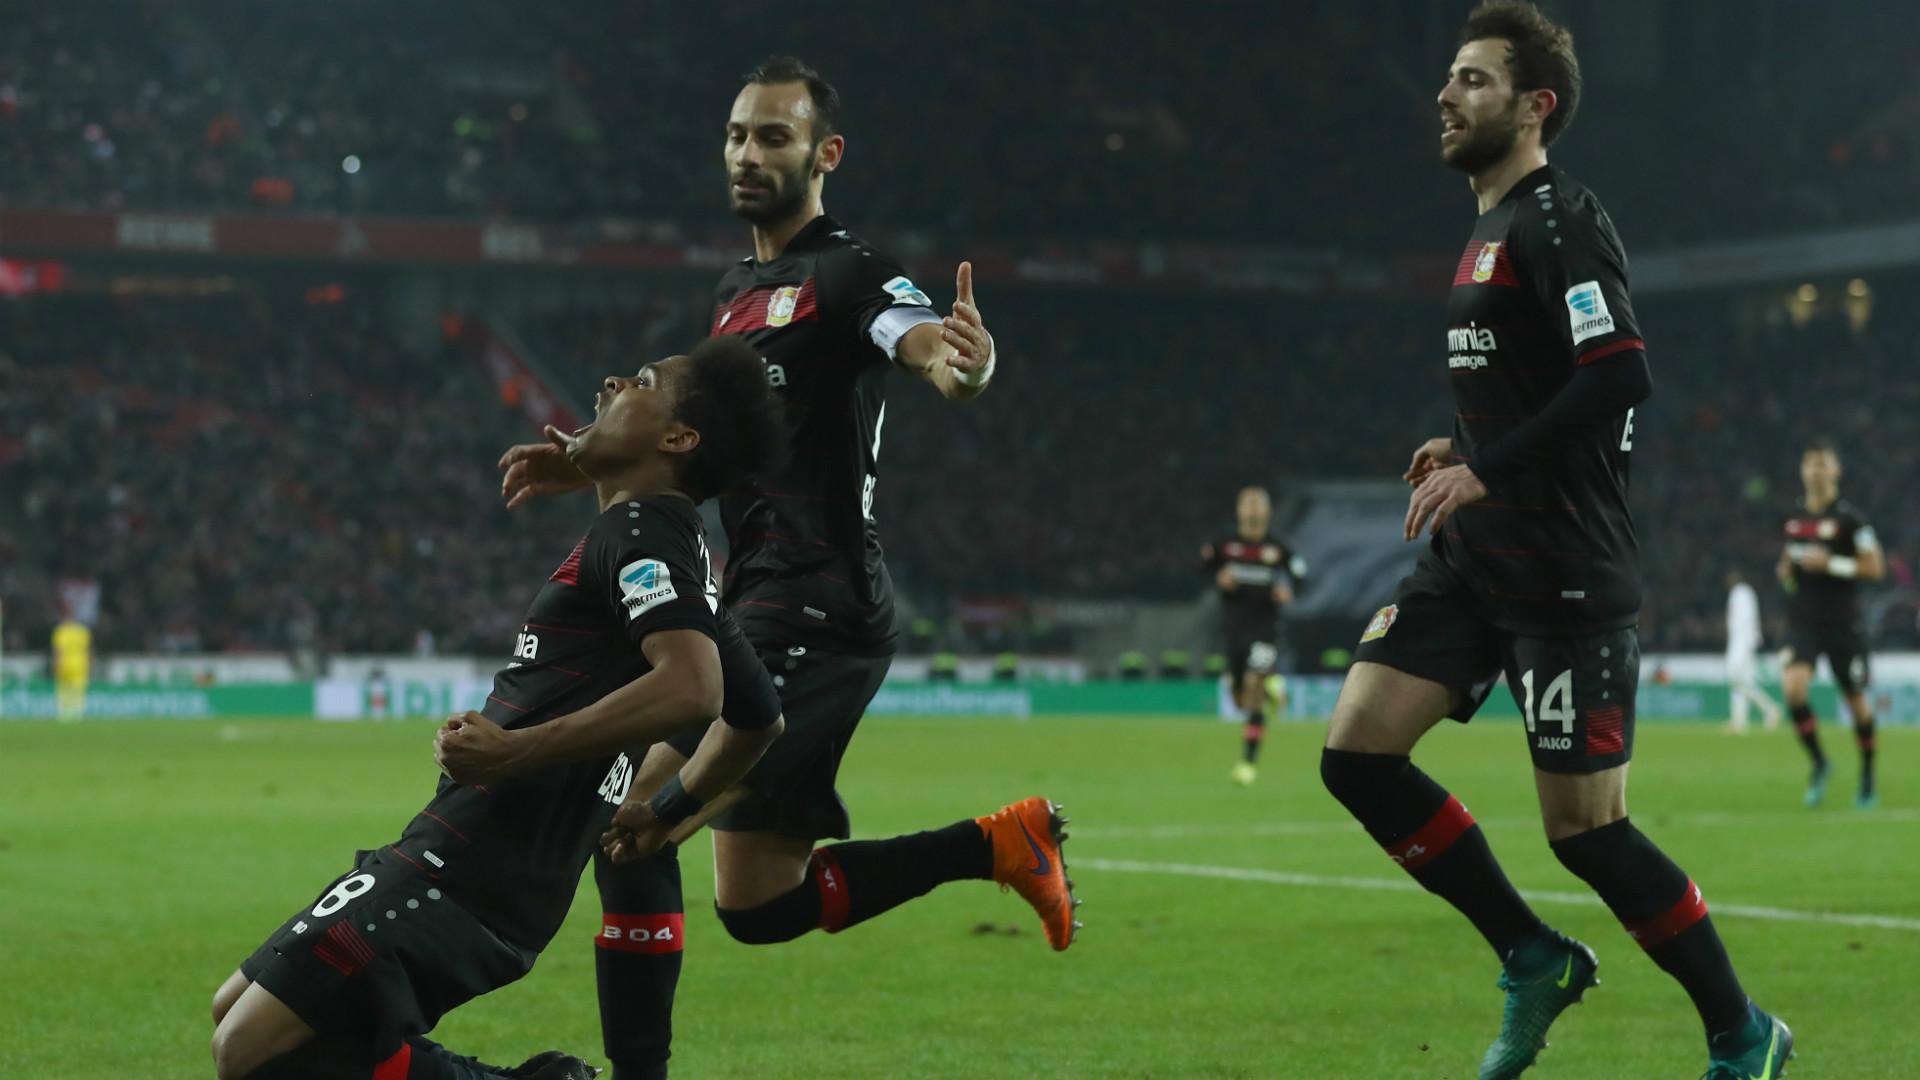 Wendell - Bayer Leverkusen - 21/12/2016